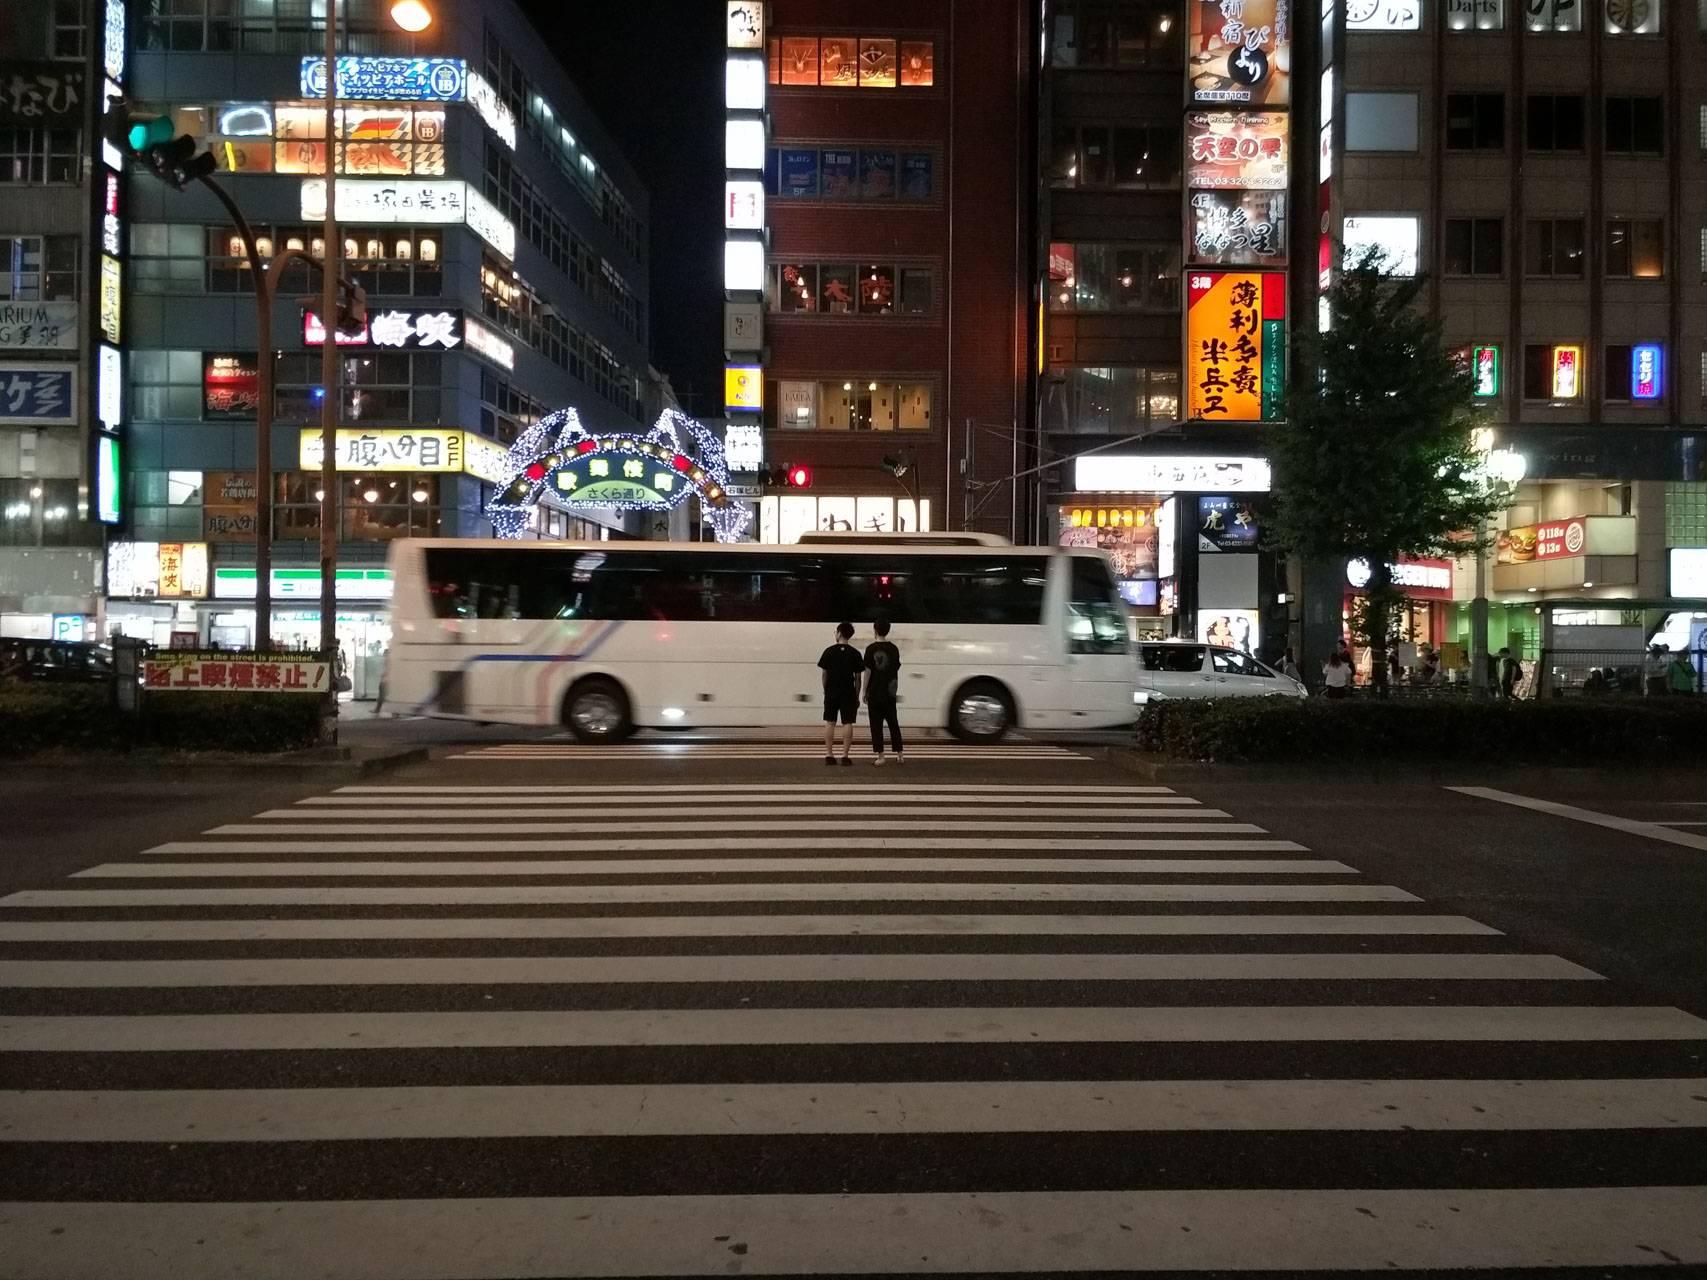 vivo X9s Plus camera sample Photo by Hao Ying-8